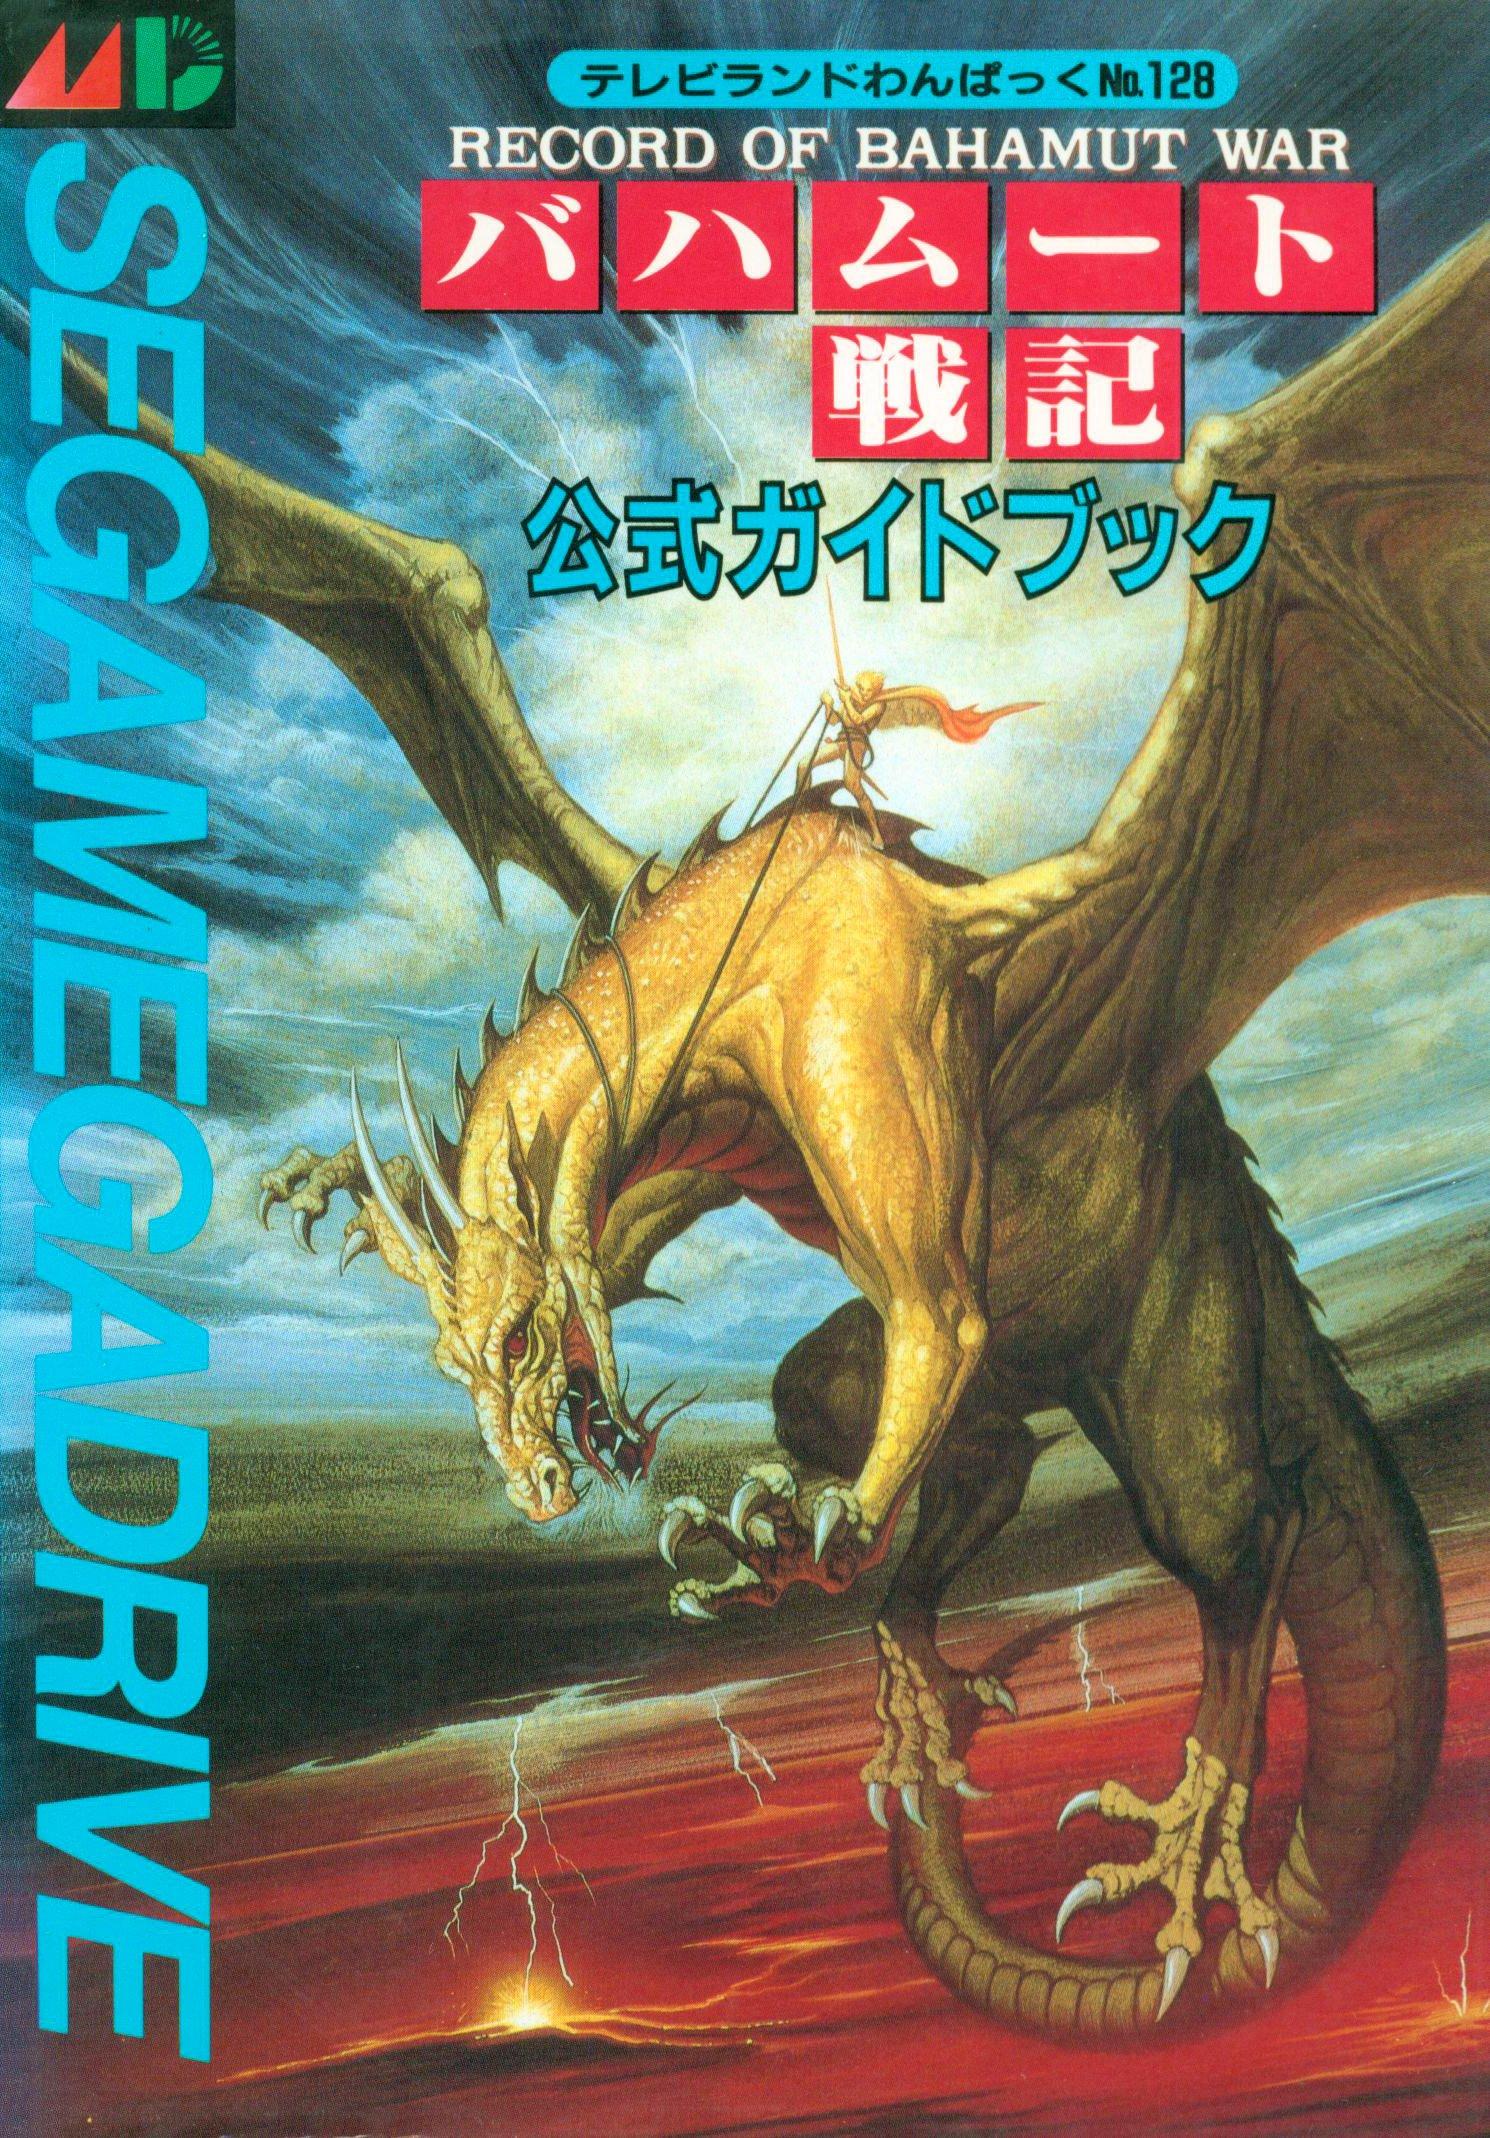 large.214409357_BahamutSenki(RecordofBahamutWar)-OfficialGuideBook.jpg